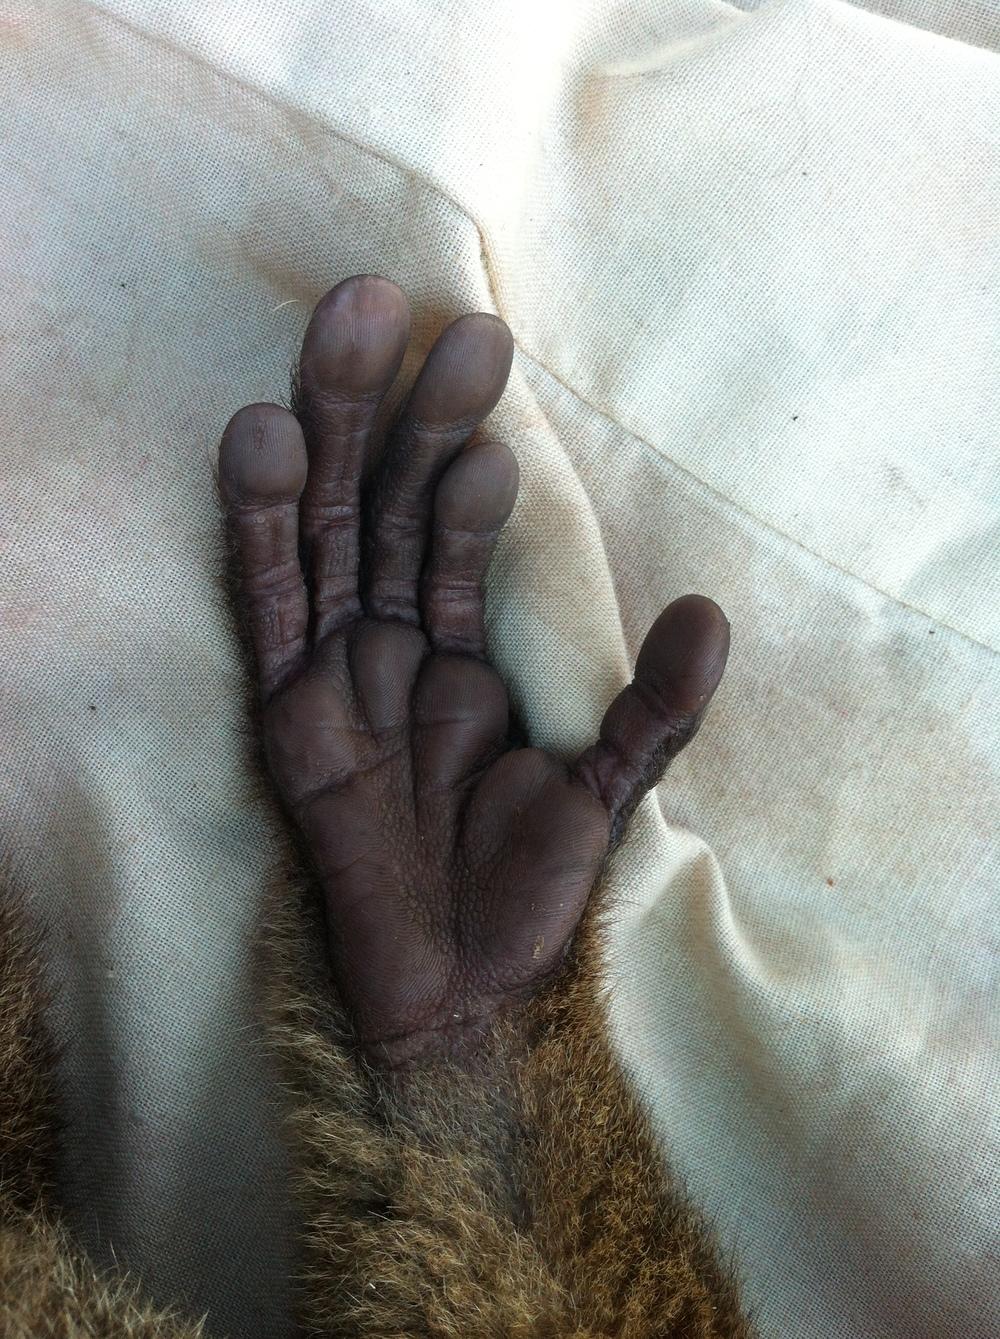 Hand of a greater bamboo lemur ( Prolemur simus ), Kianjavato, Madagascar